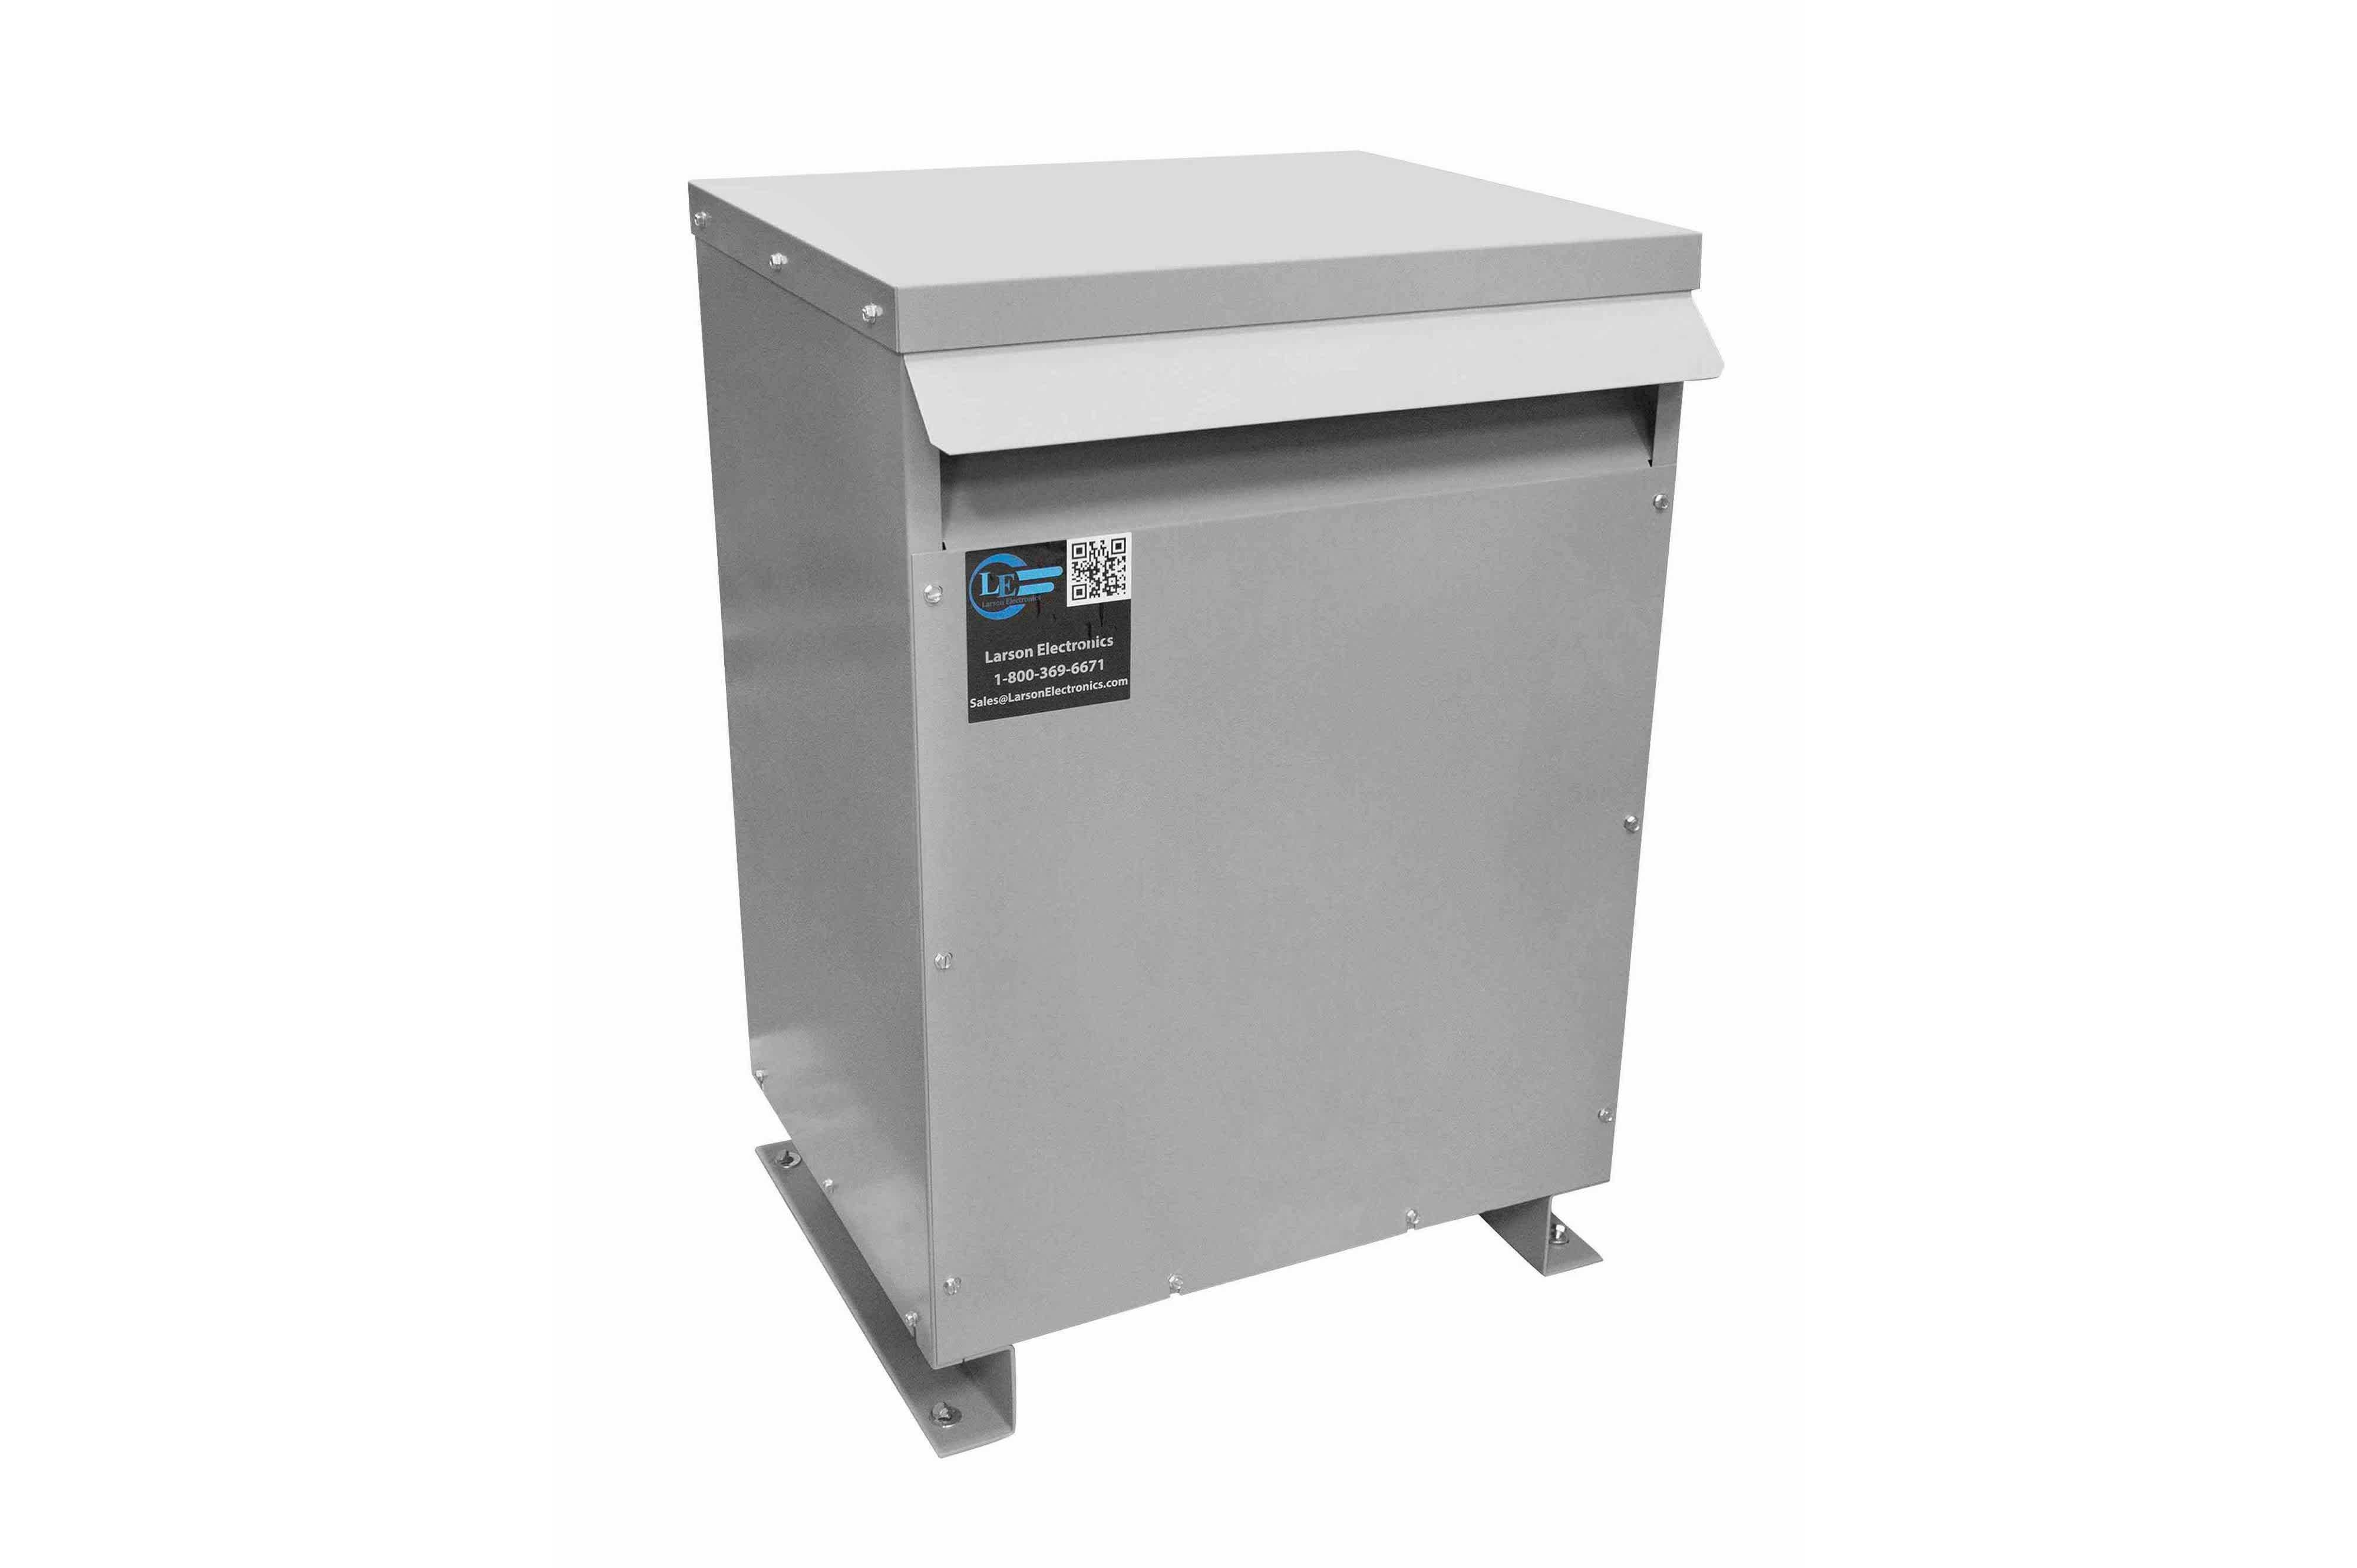 11 kVA 3PH Isolation Transformer, 220V Wye Primary, 480Y/277 Wye-N Secondary, N3R, Ventilated, 60 Hz